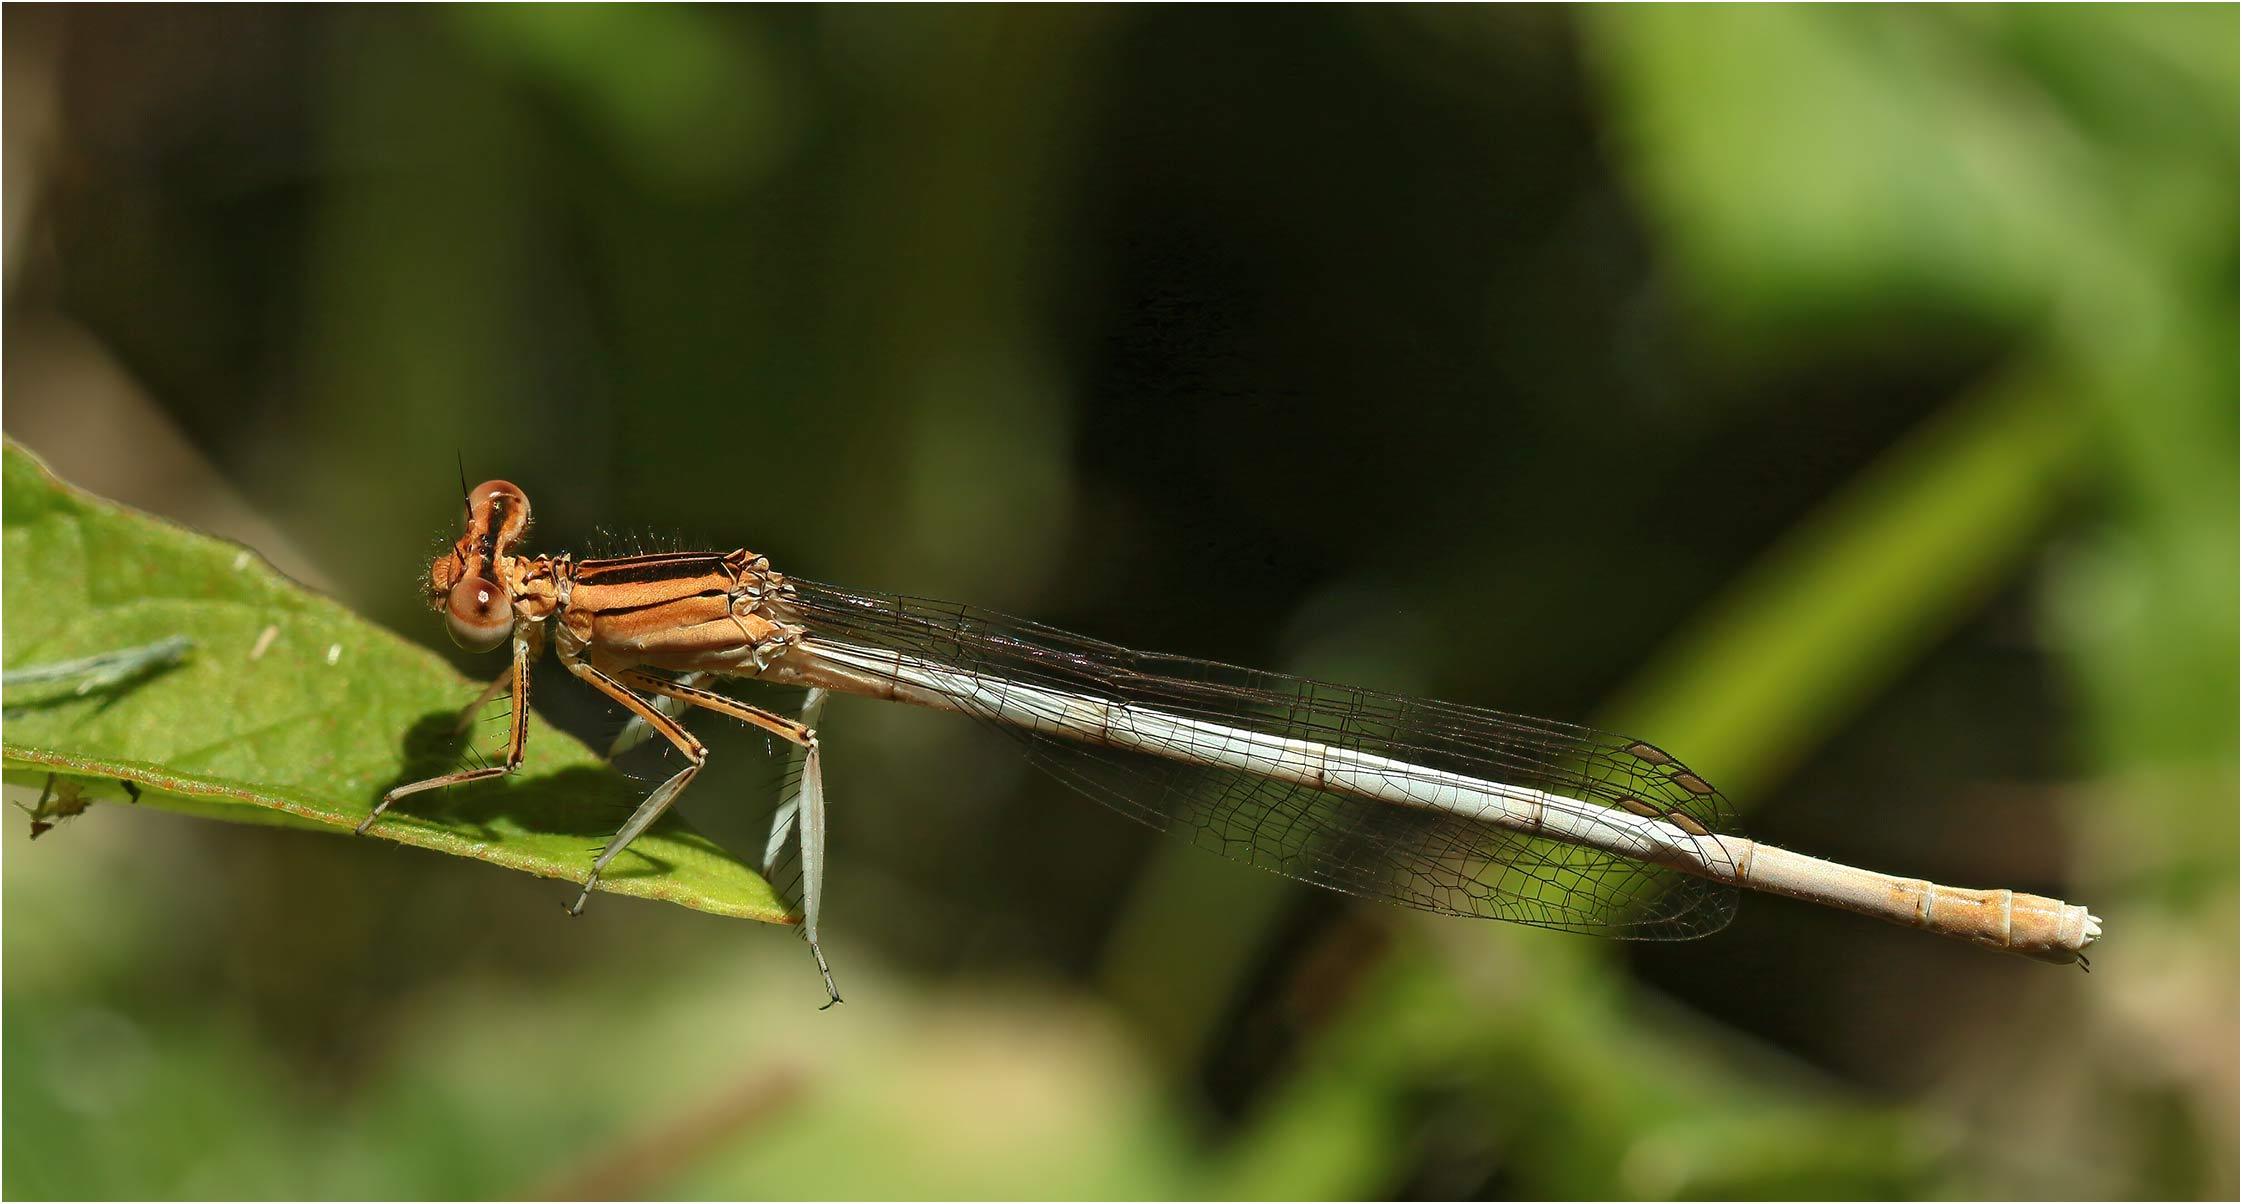 Platycnemis latipes femelle, l'Isle sur Tarn (France--81), 08/07/2020